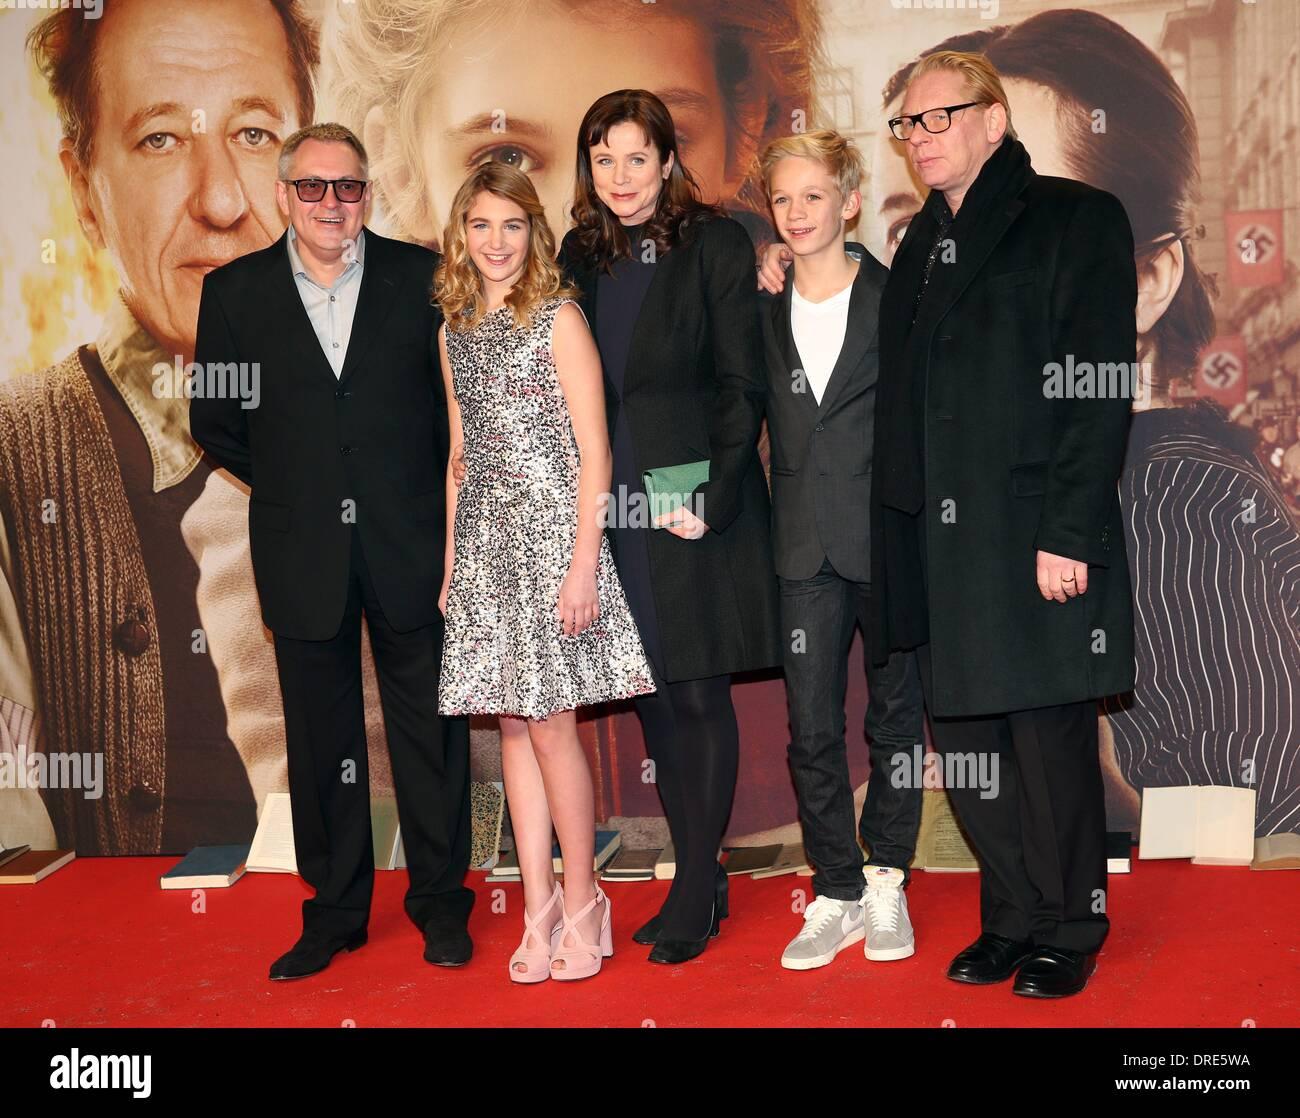 Nico liersch family - Director Brian S Percival Actors Sophie Nelisse Emily Watson Nico Liersch And